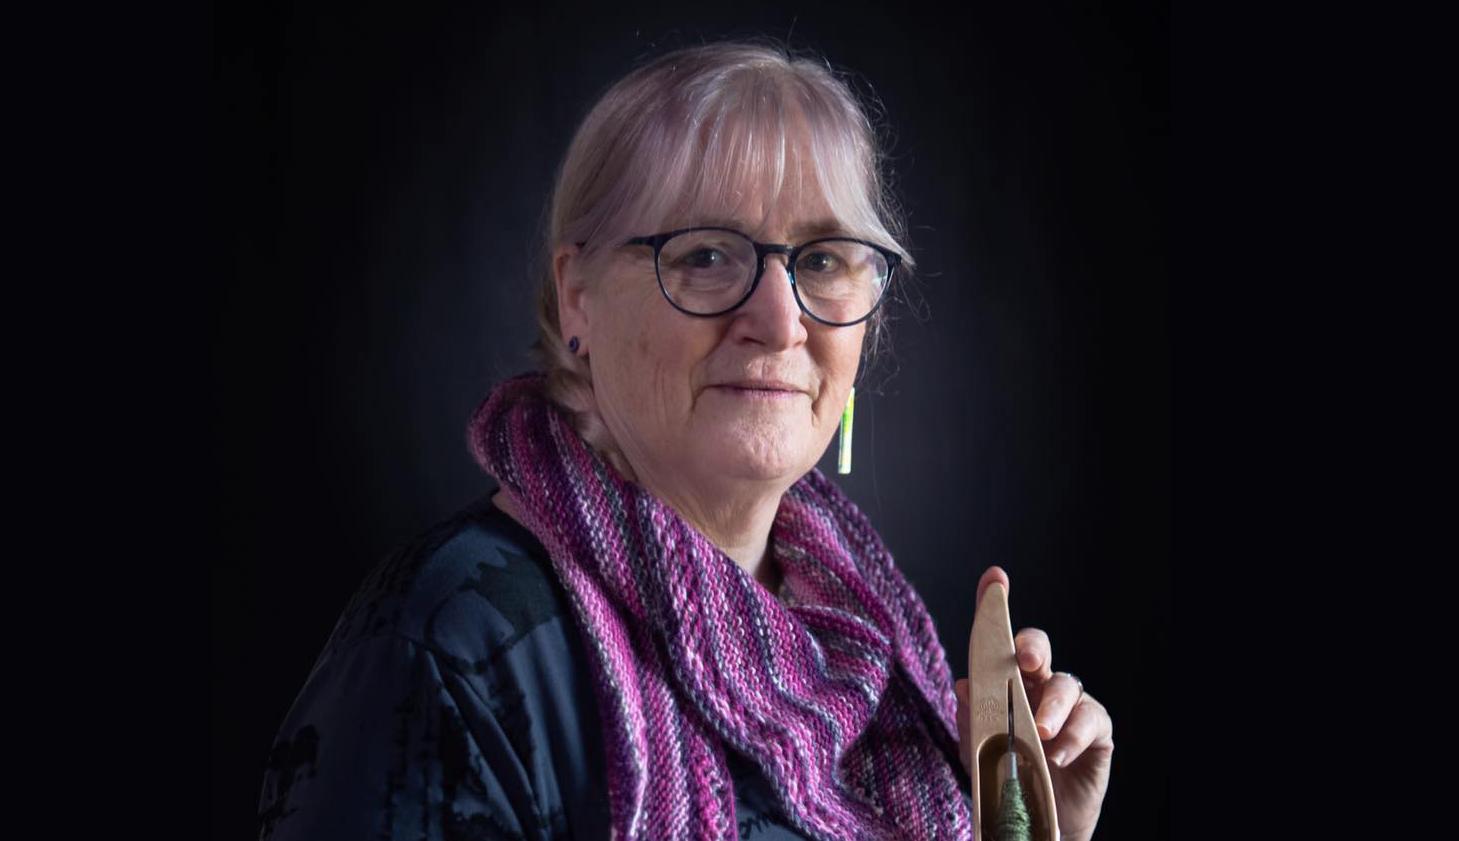 Meet the Maker: Shelley Busby